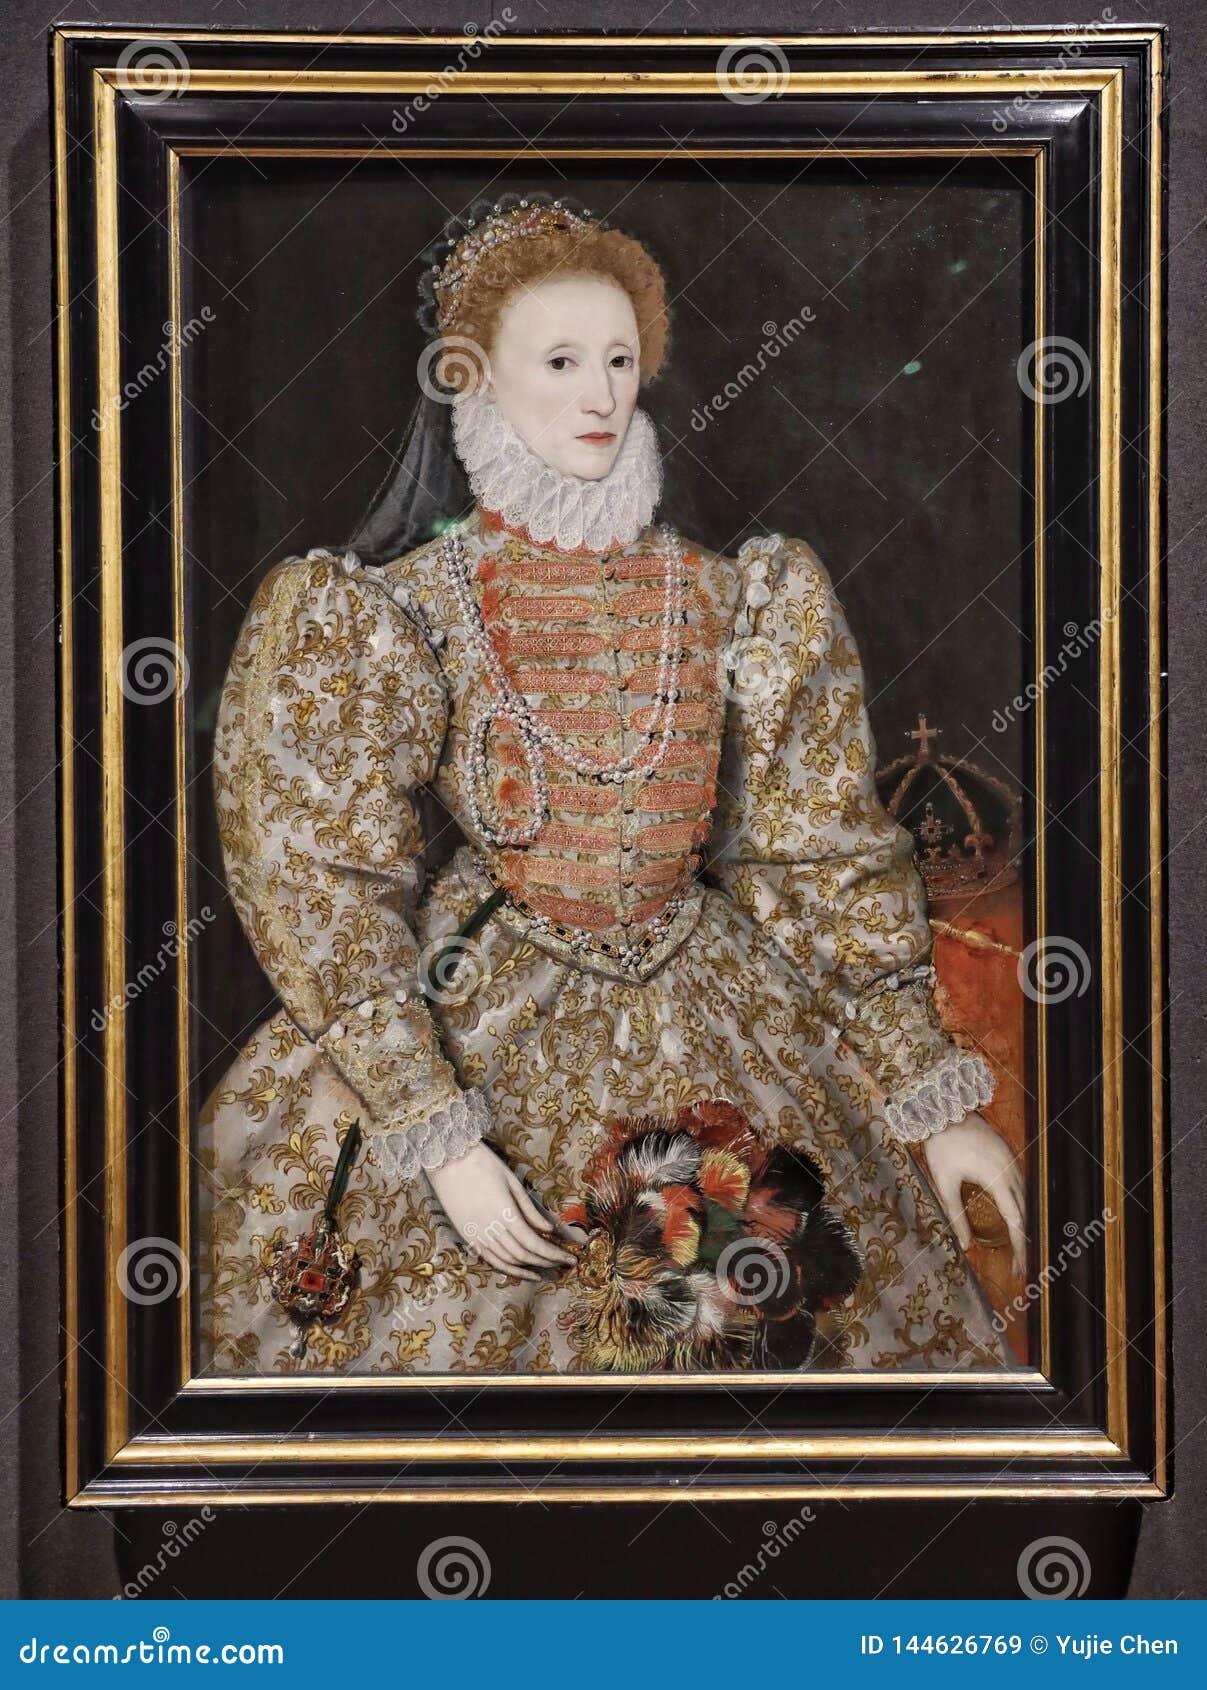 Portrait Of Queen Elizabeth I By An Unkown English Artist